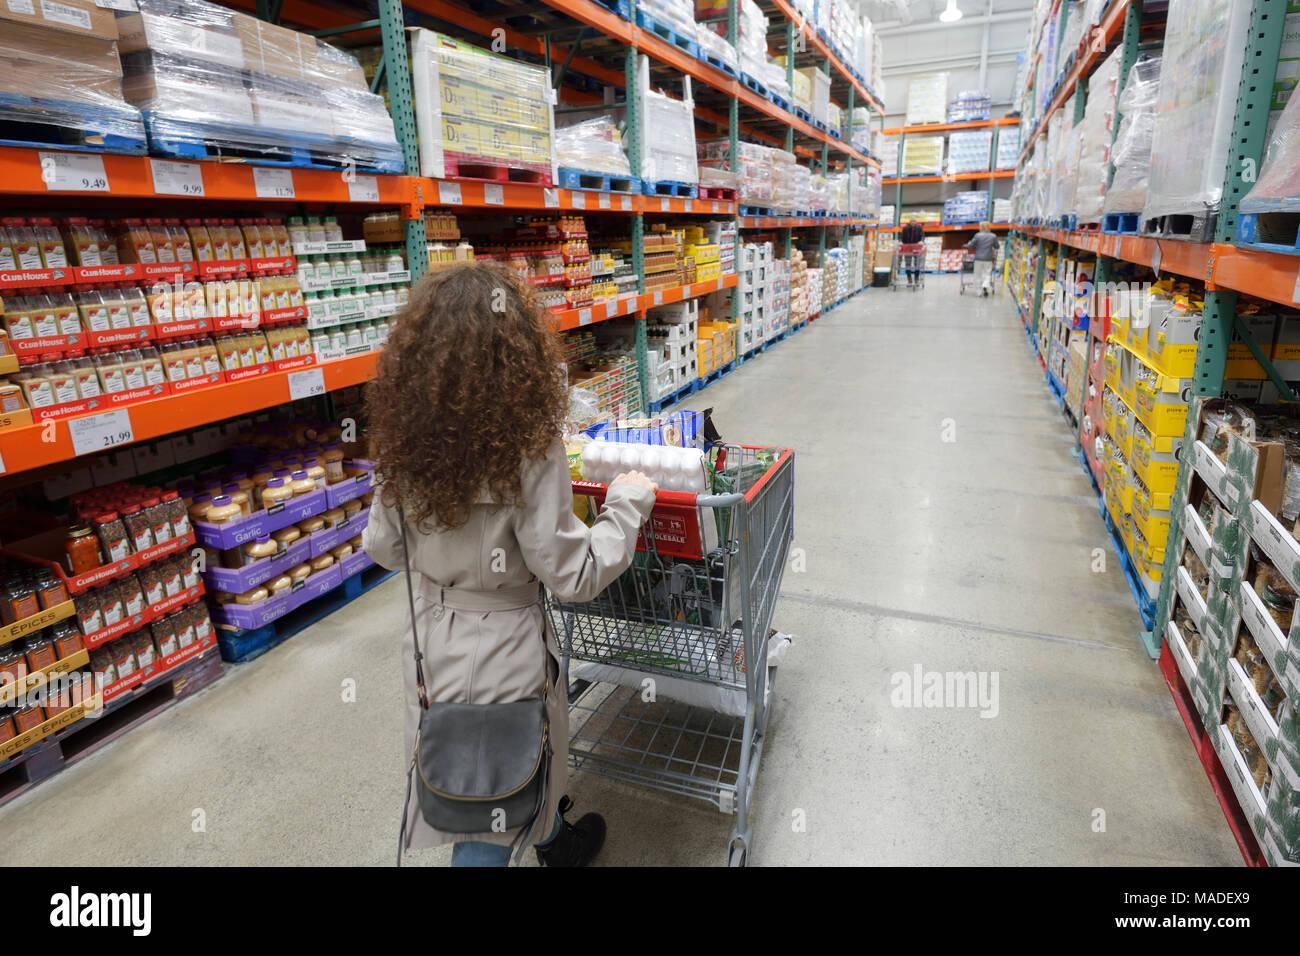 aisle american supermarket stock photos aisle american supermarket stock images alamy. Black Bedroom Furniture Sets. Home Design Ideas